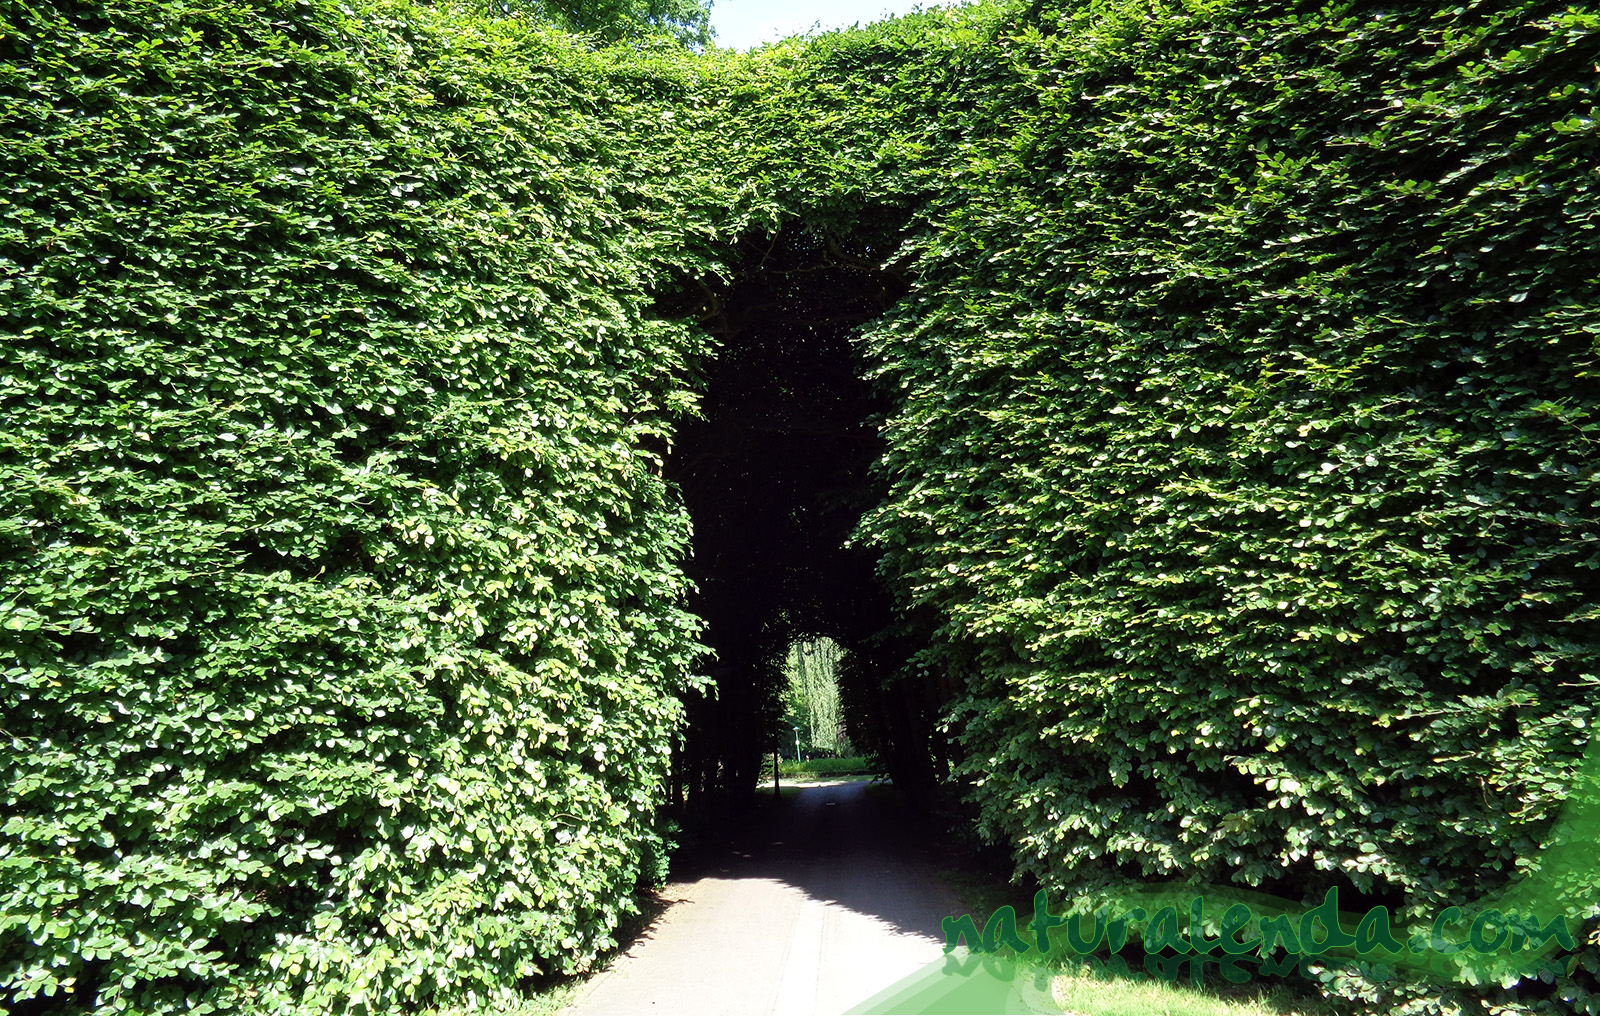 tunel vegetal